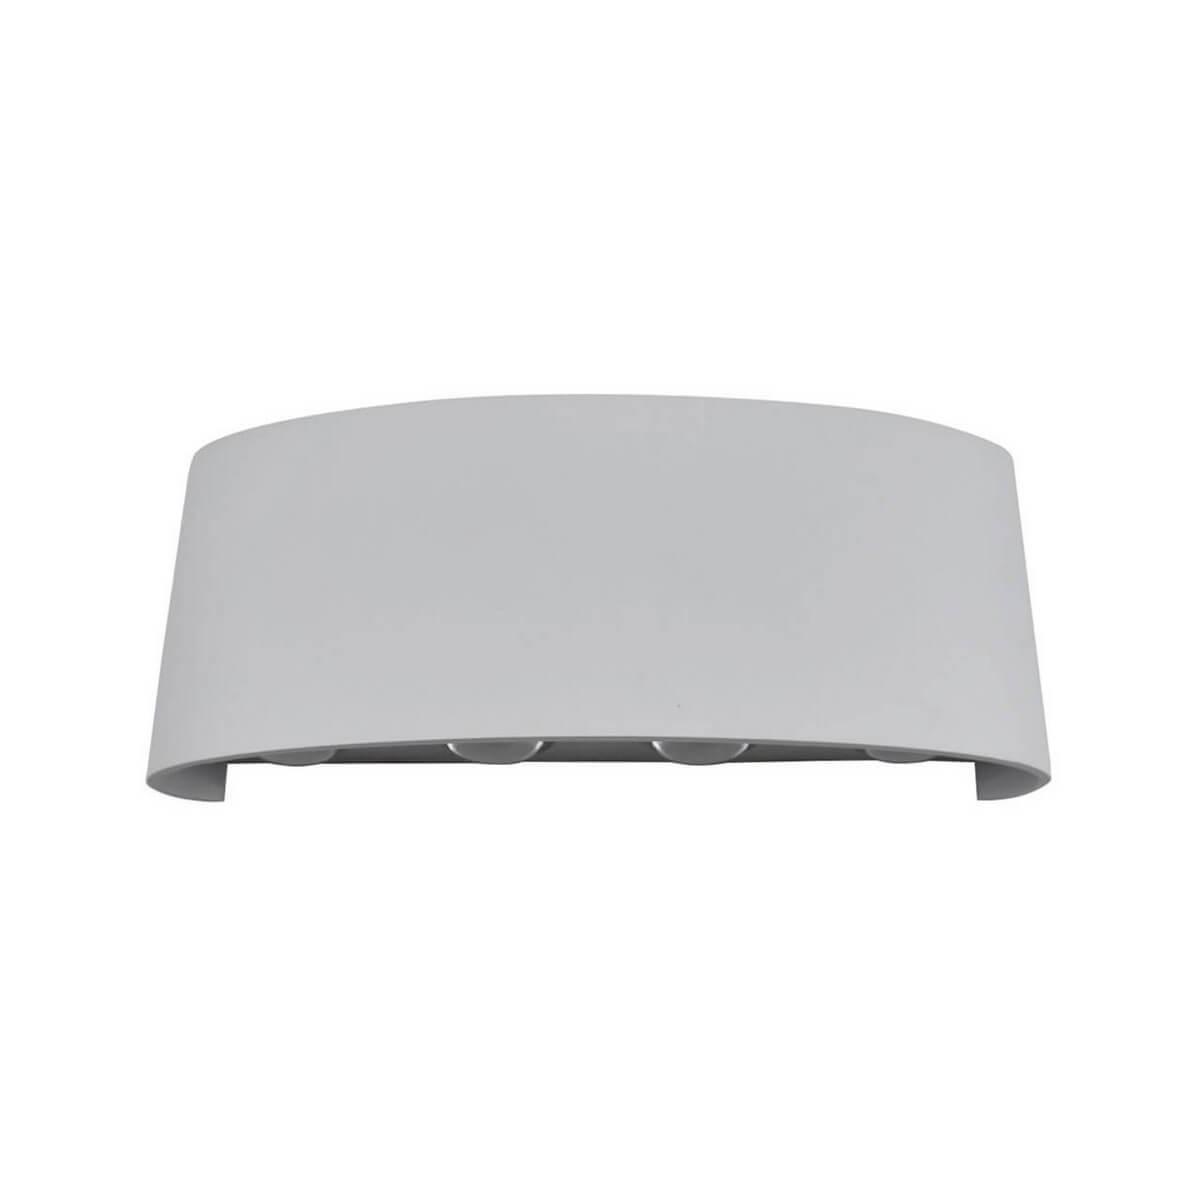 все цены на Уличный светильник Kink Light 08573,01, LED онлайн